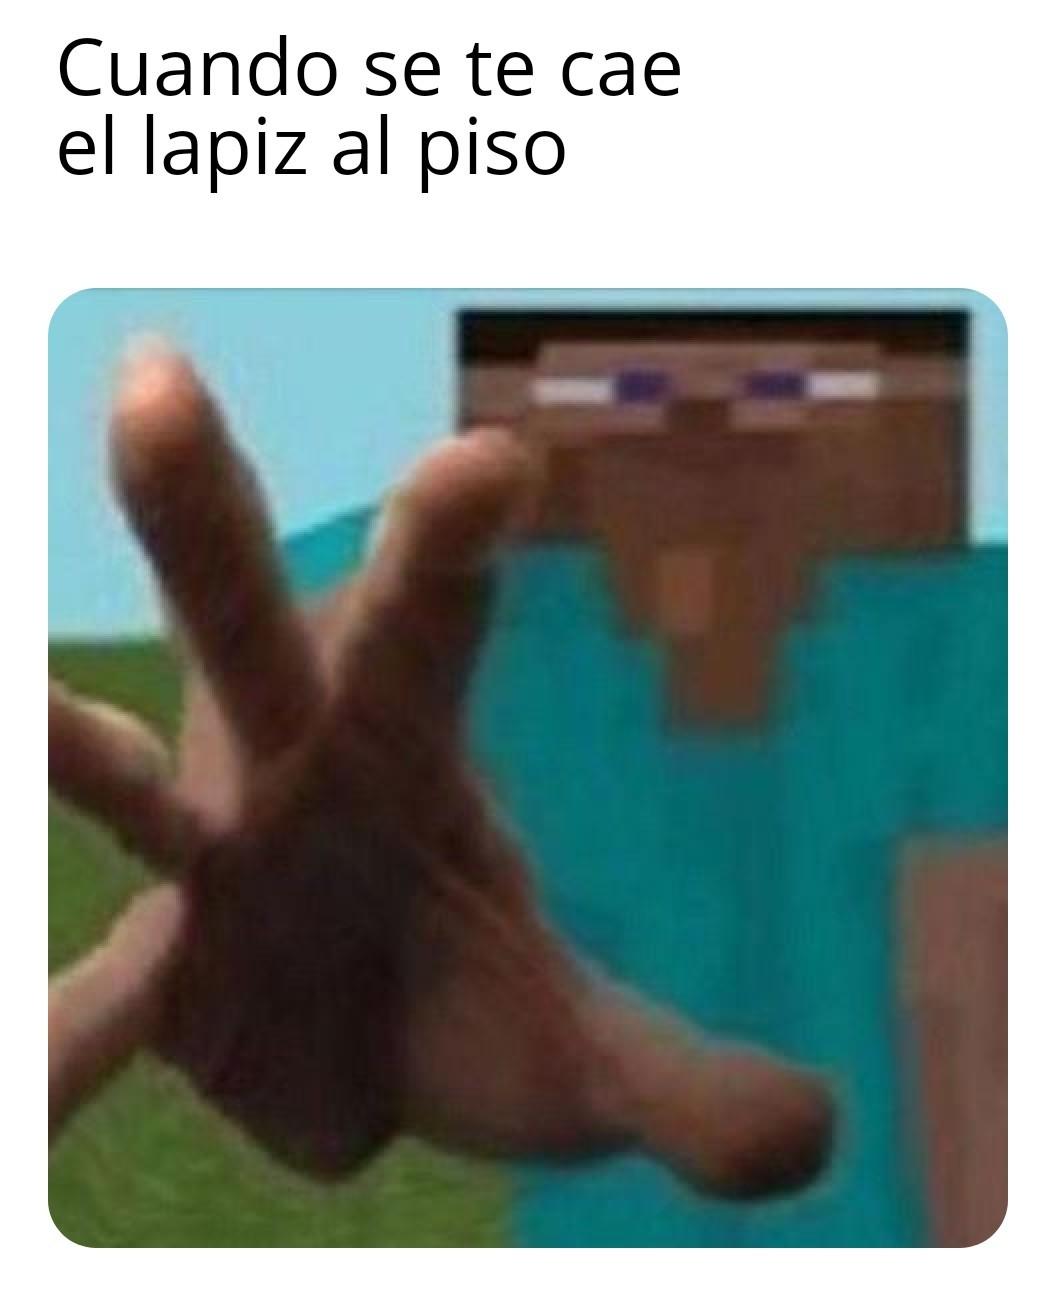 Pobre lapiz - meme